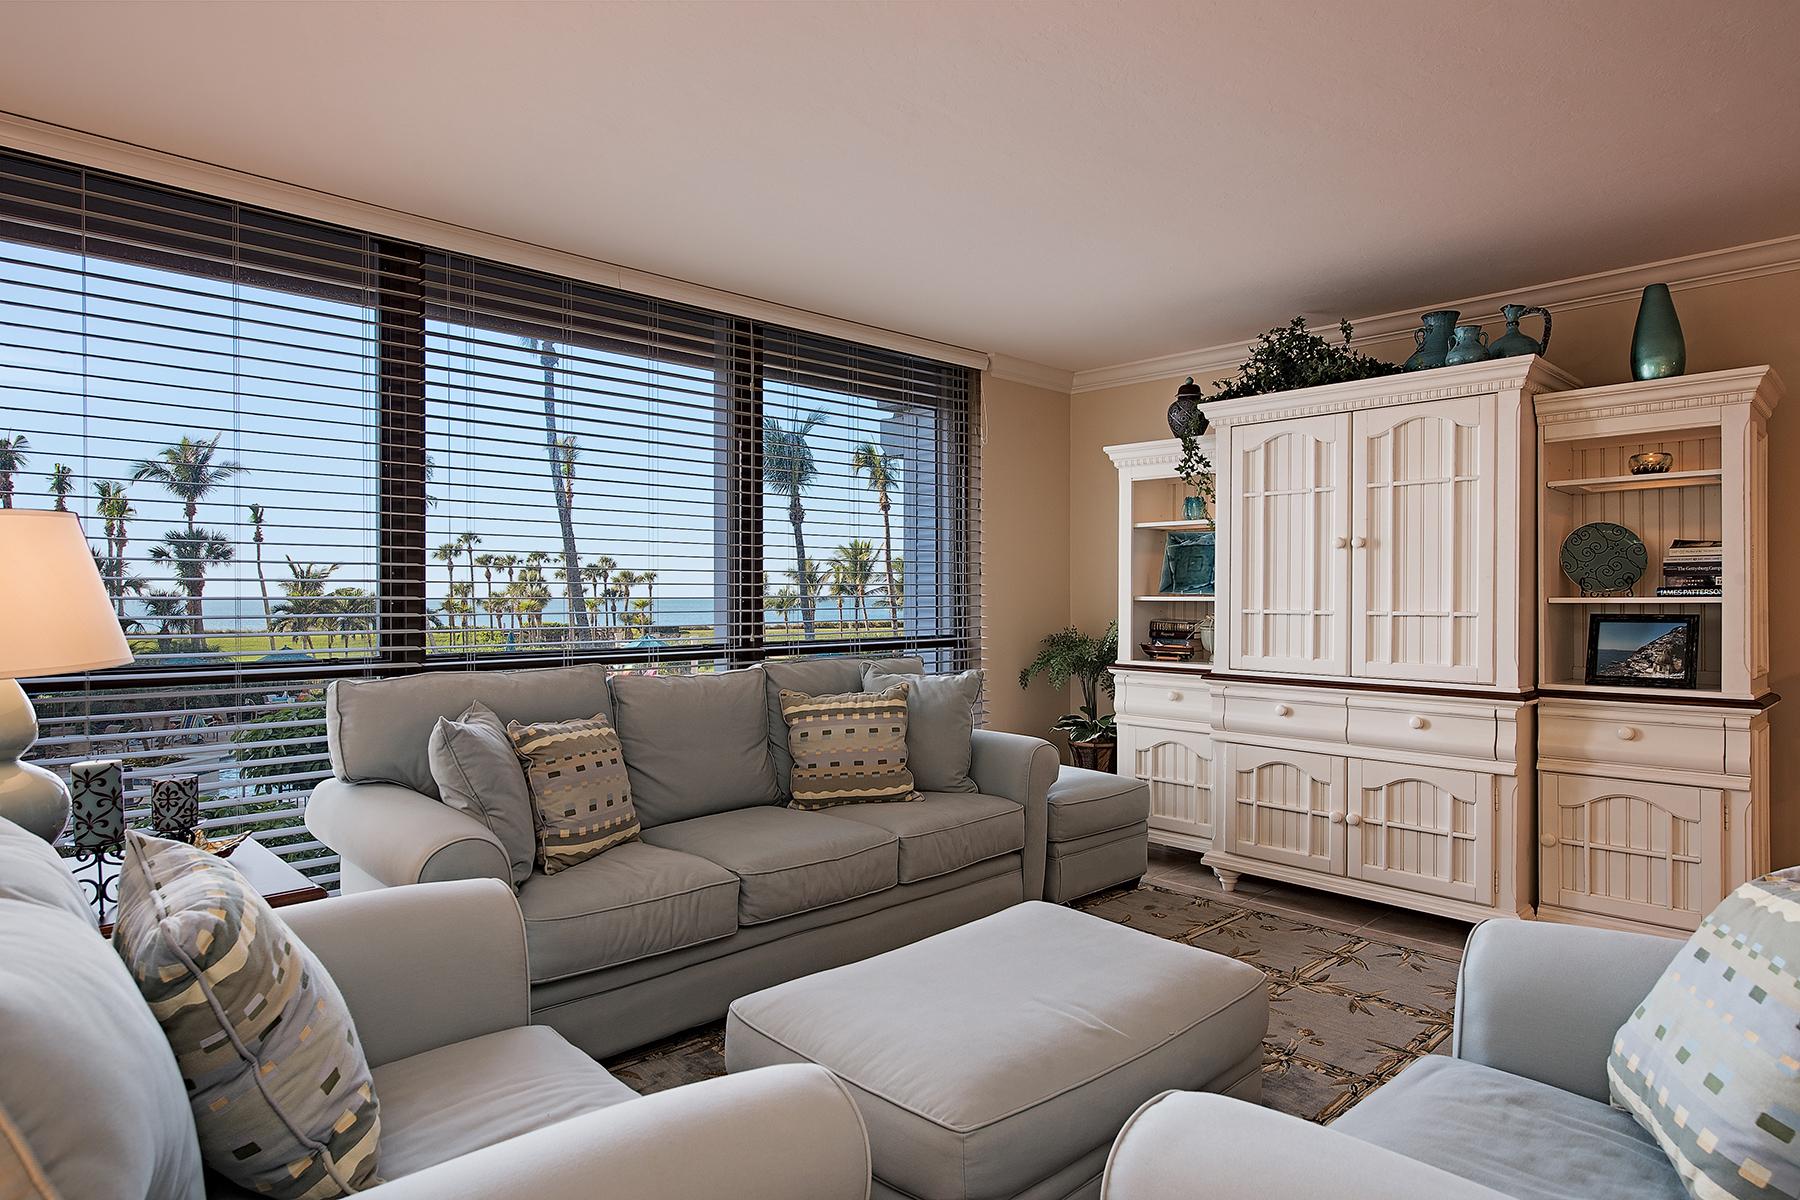 Condominium for Sale at PARK SHORE - MONACO BEACH CLUB 4401 Gulf Shore Blvd N B-203, Naples, Florida 34103 United States